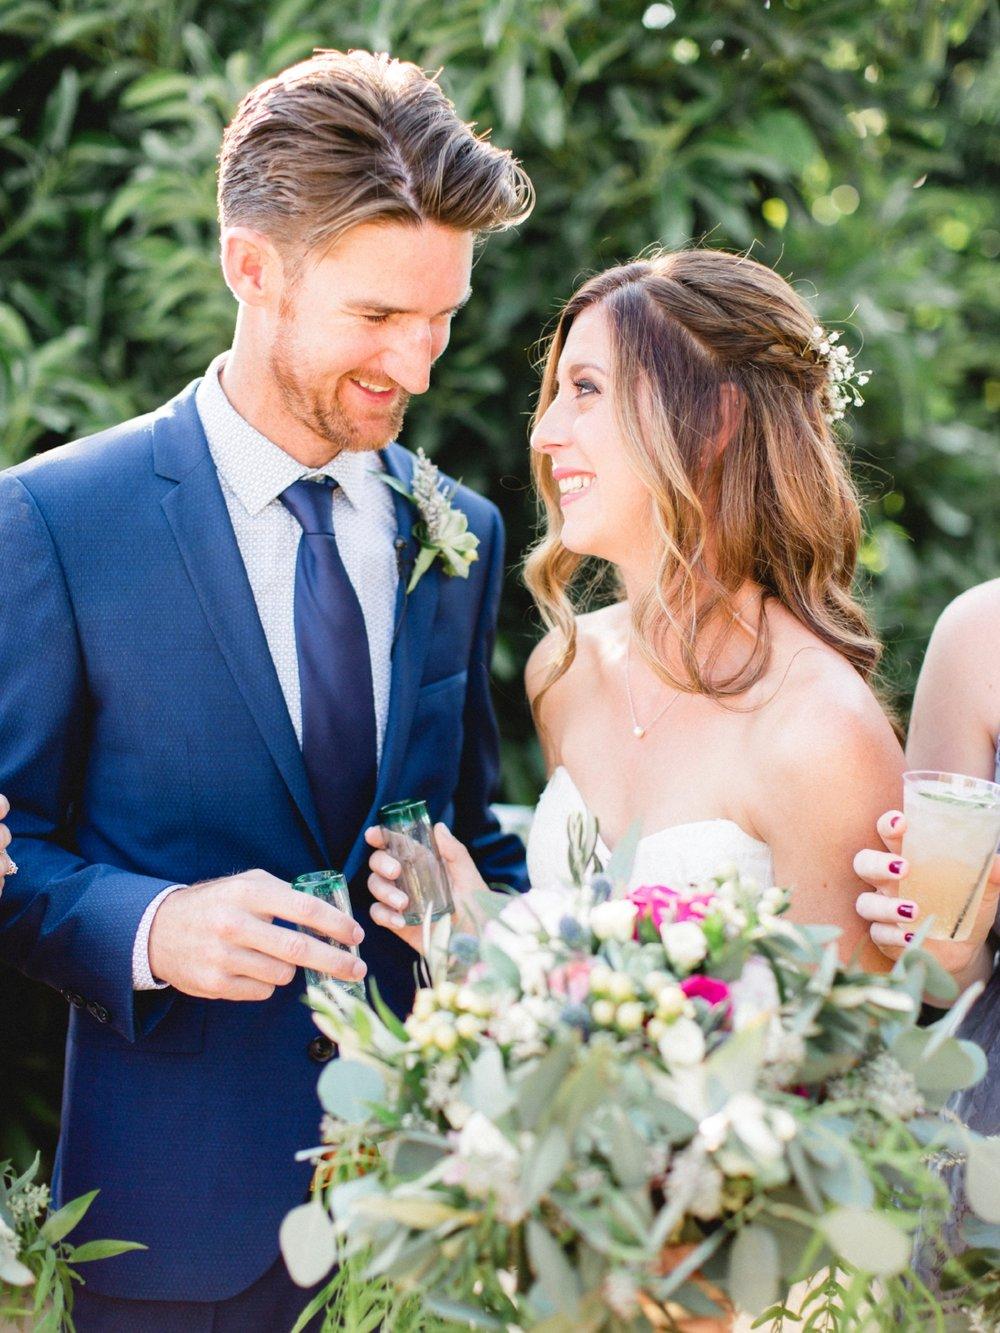 Megan & Peter Gerry Ranch Wedding 2018 Rhianna Mercier Photography -21244.jpg